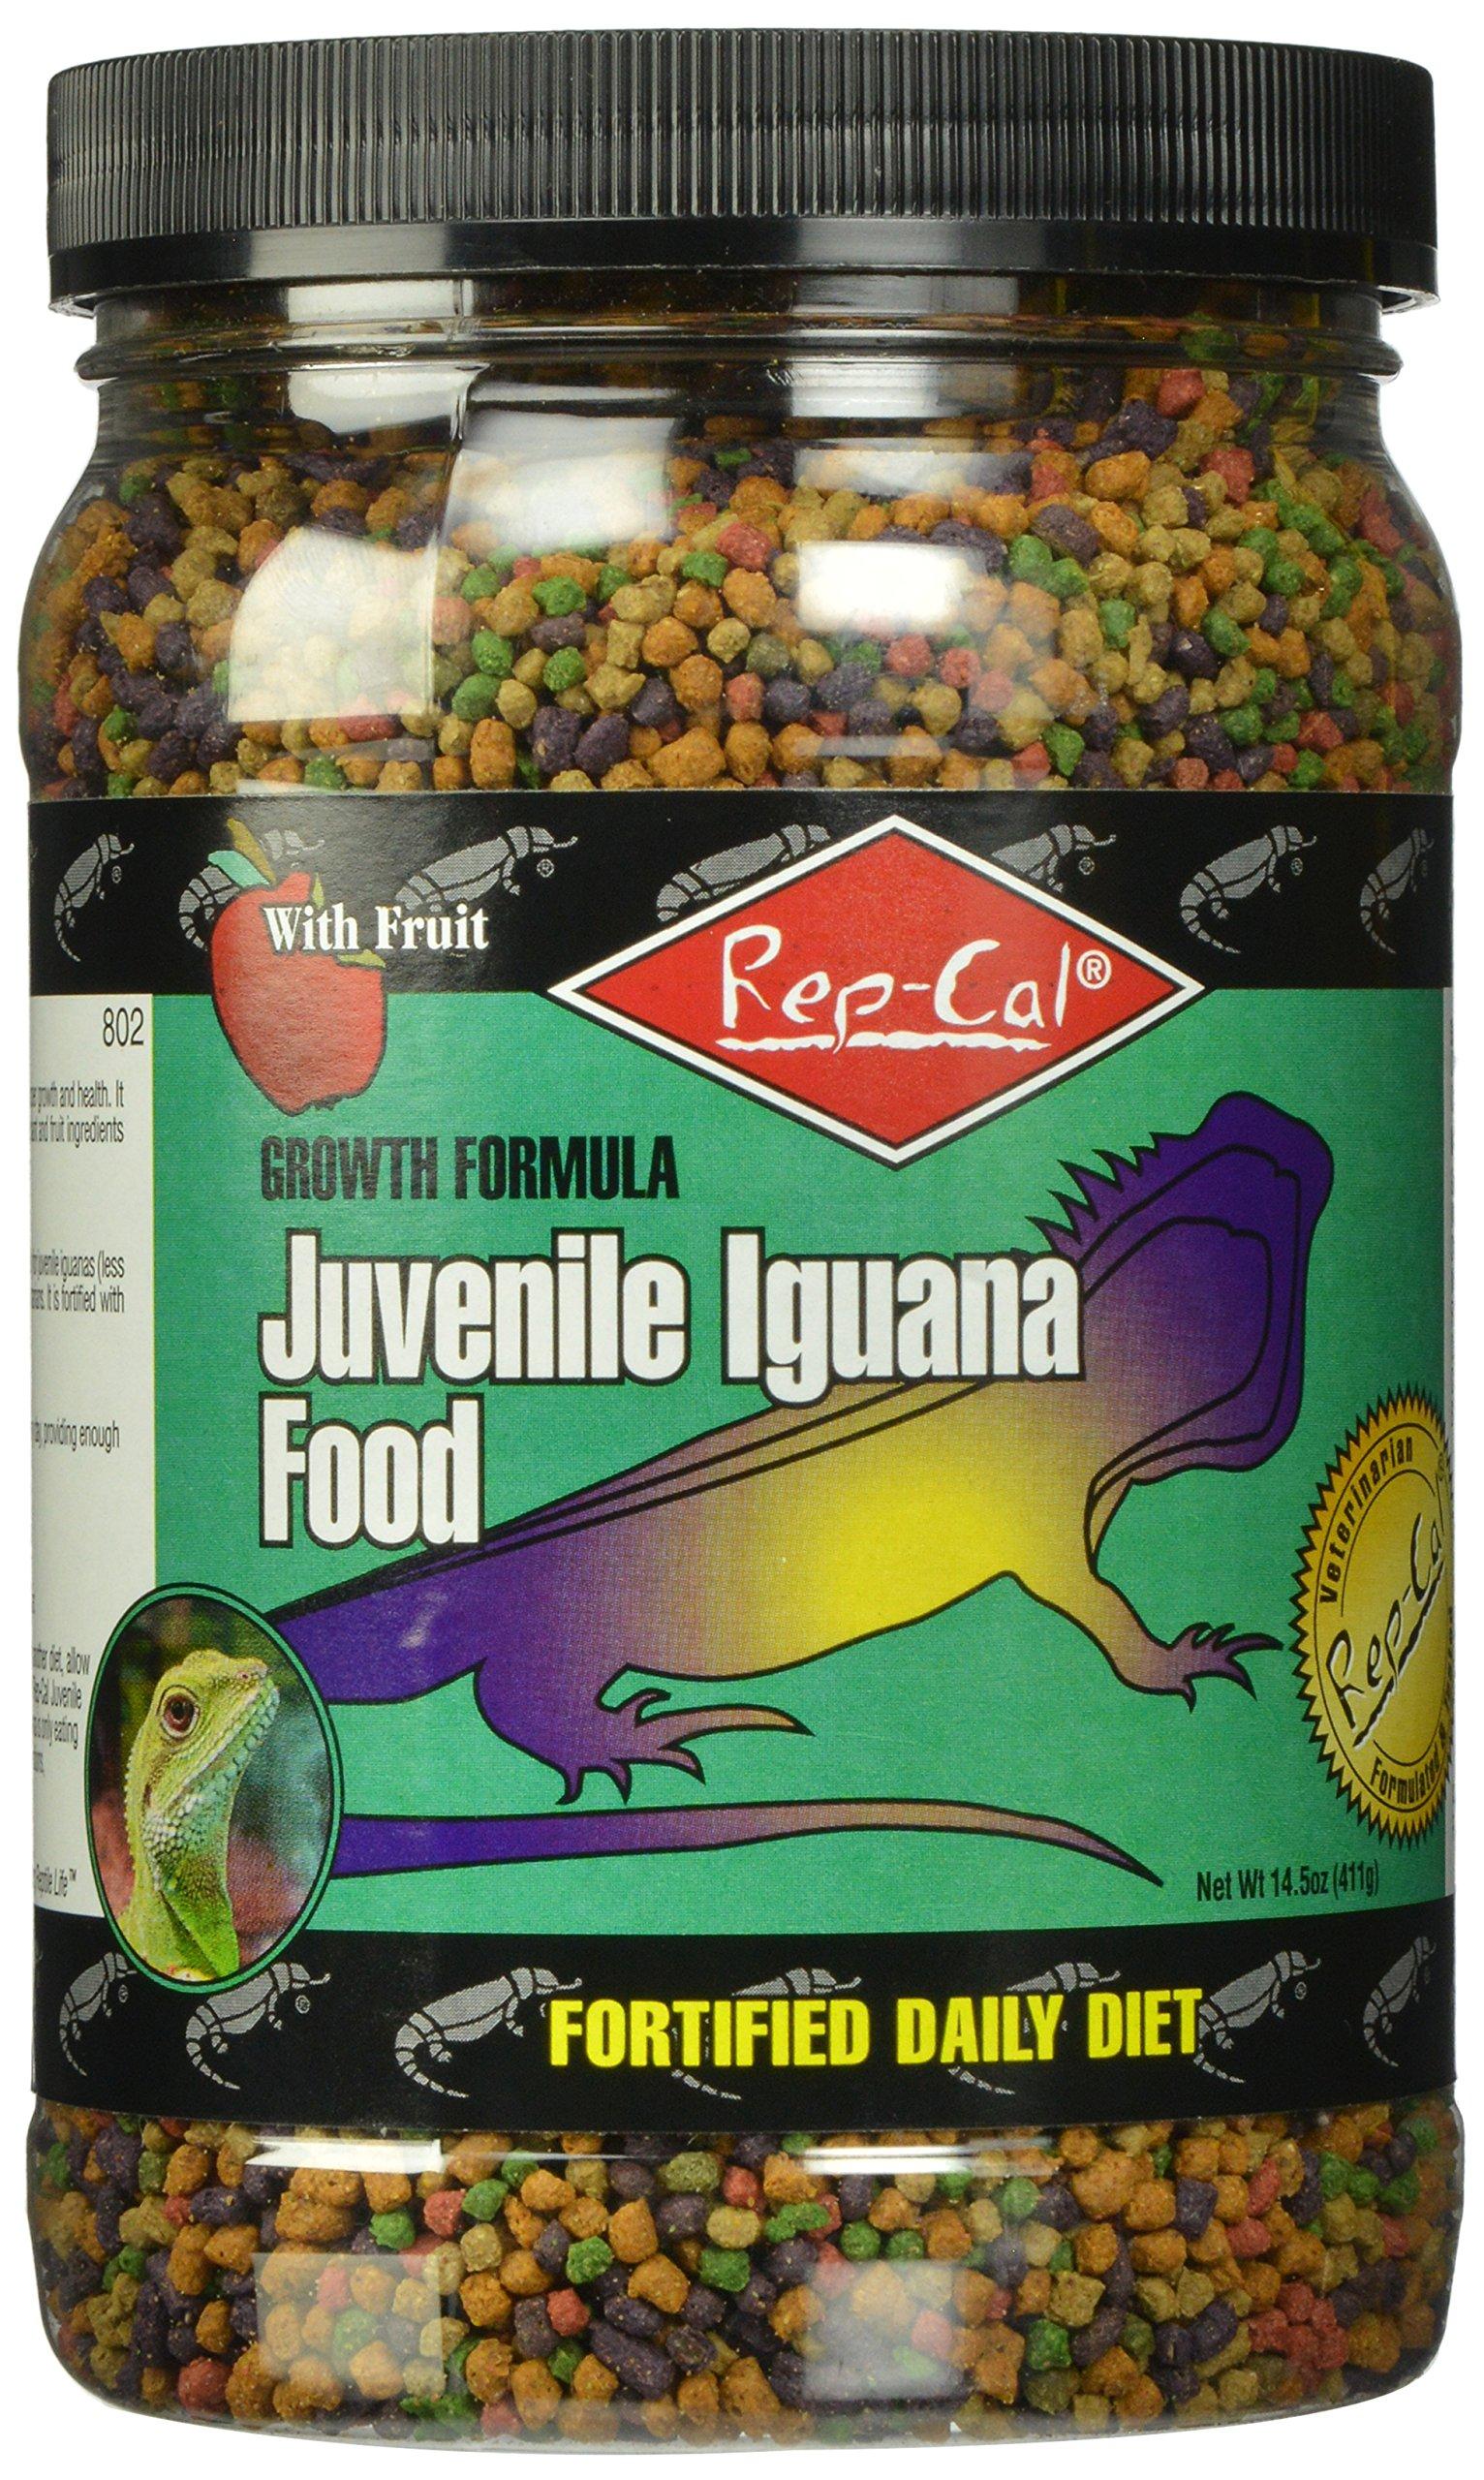 Rep-Cal SRP00802 Juvenile Iguana Food, 14.5-Ounce by Rep-Cal